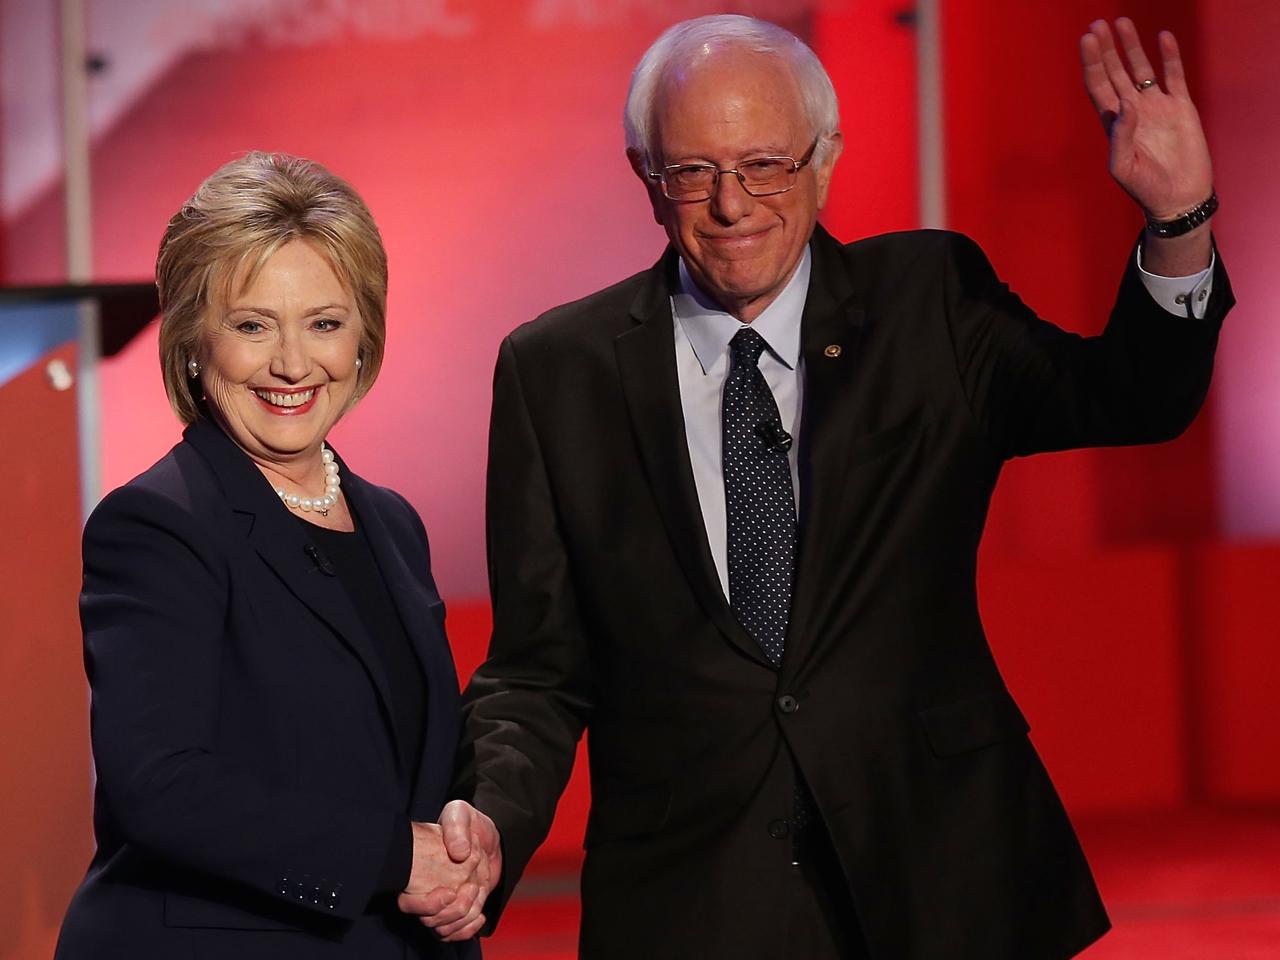 Democratic Presidential Candidates Hillary Clinton And Bernie Sanders Debate In Durham, New Hampshire